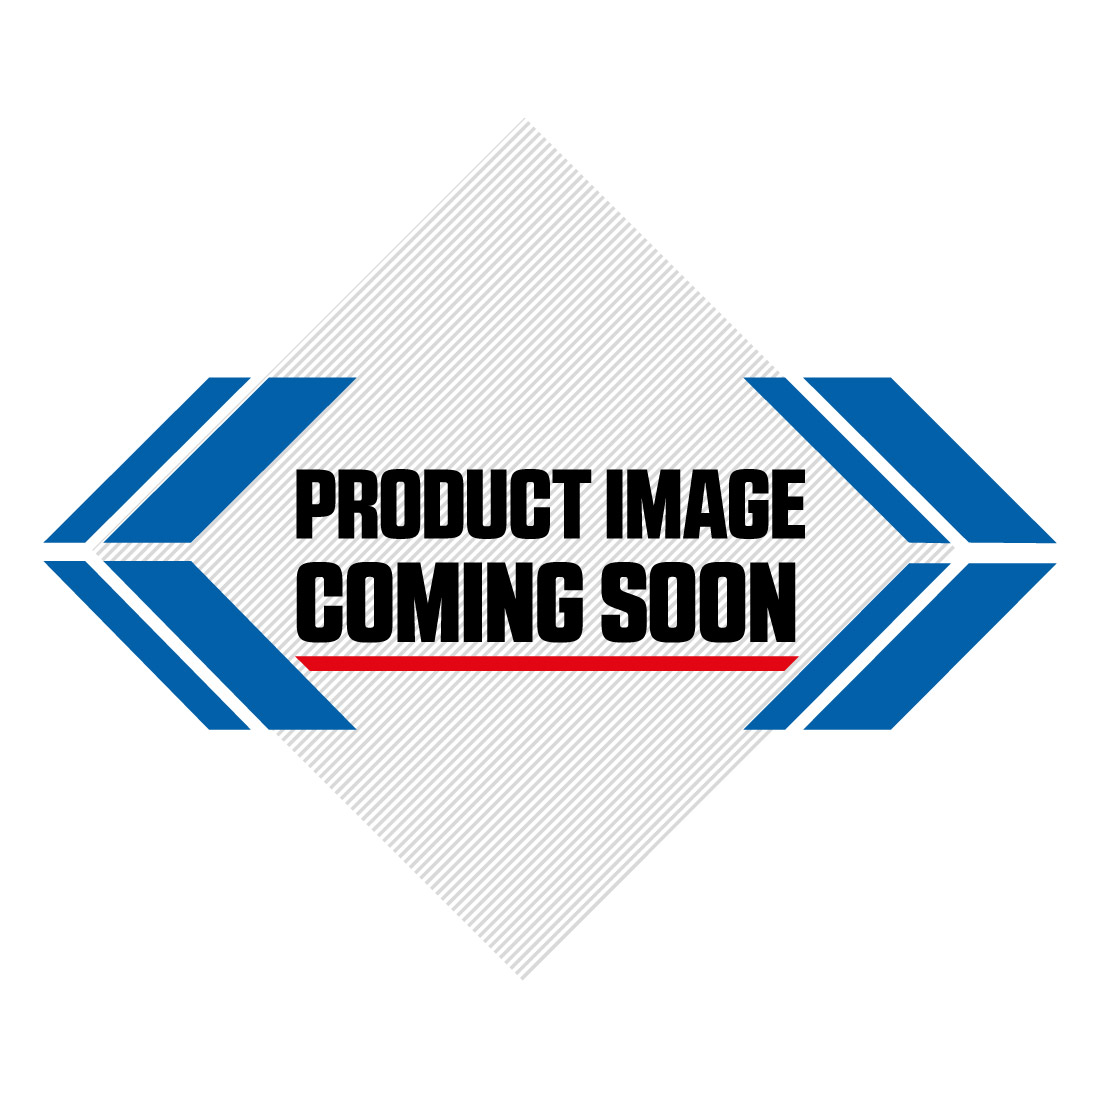 Renthal Twinring Rear Sprocket Kawasaki KX KXF KDX KLX Suzuki RMZ - Green Image-6>